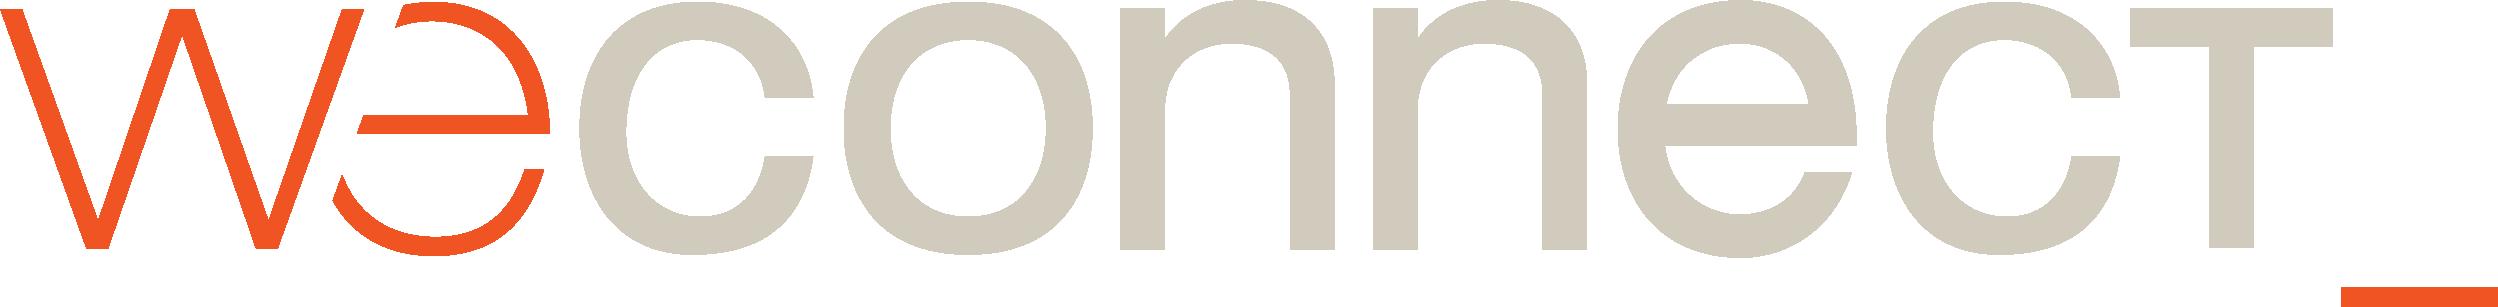 logo weconnect blanco